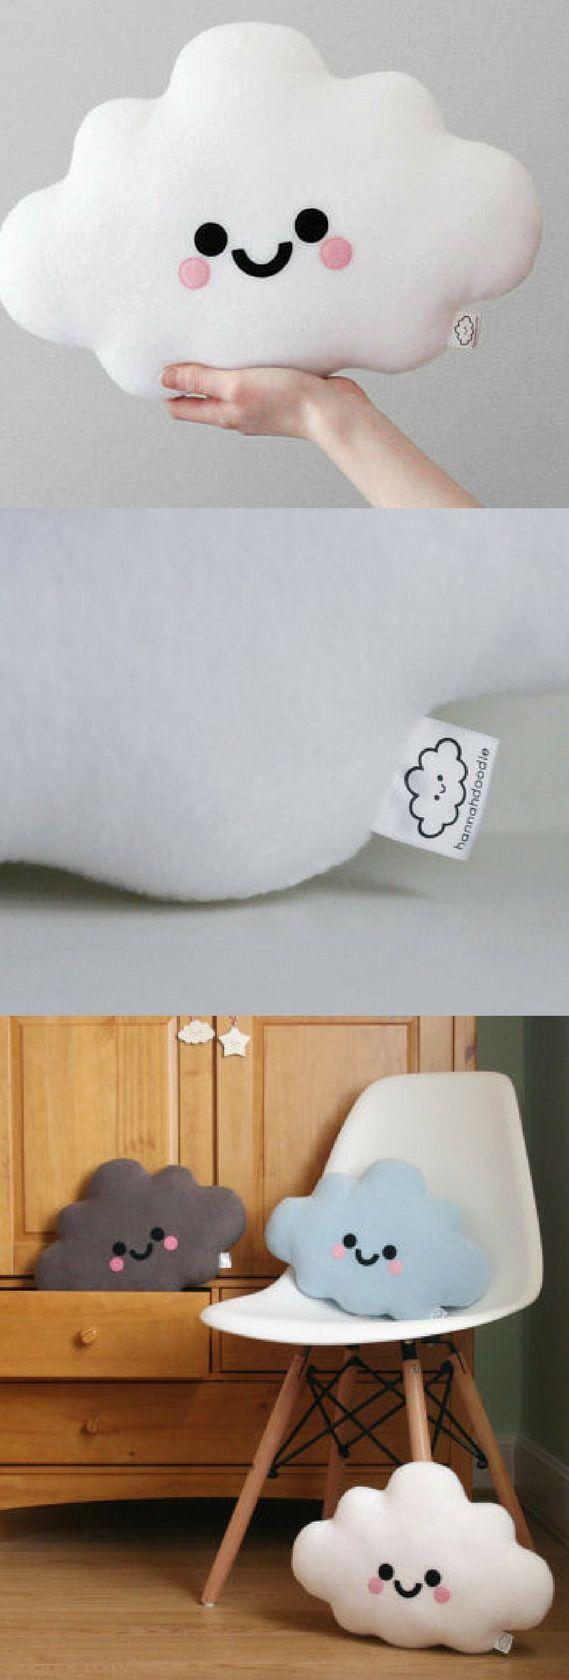 White Cloud Cushion, Nursery Decor, Happy Face Pillow, Kawaii Plushie, Soft Plush Room Accessory #affiliate #cloud #cushion #cloudcushion #pillow #kid #child #cute #nursery #trending